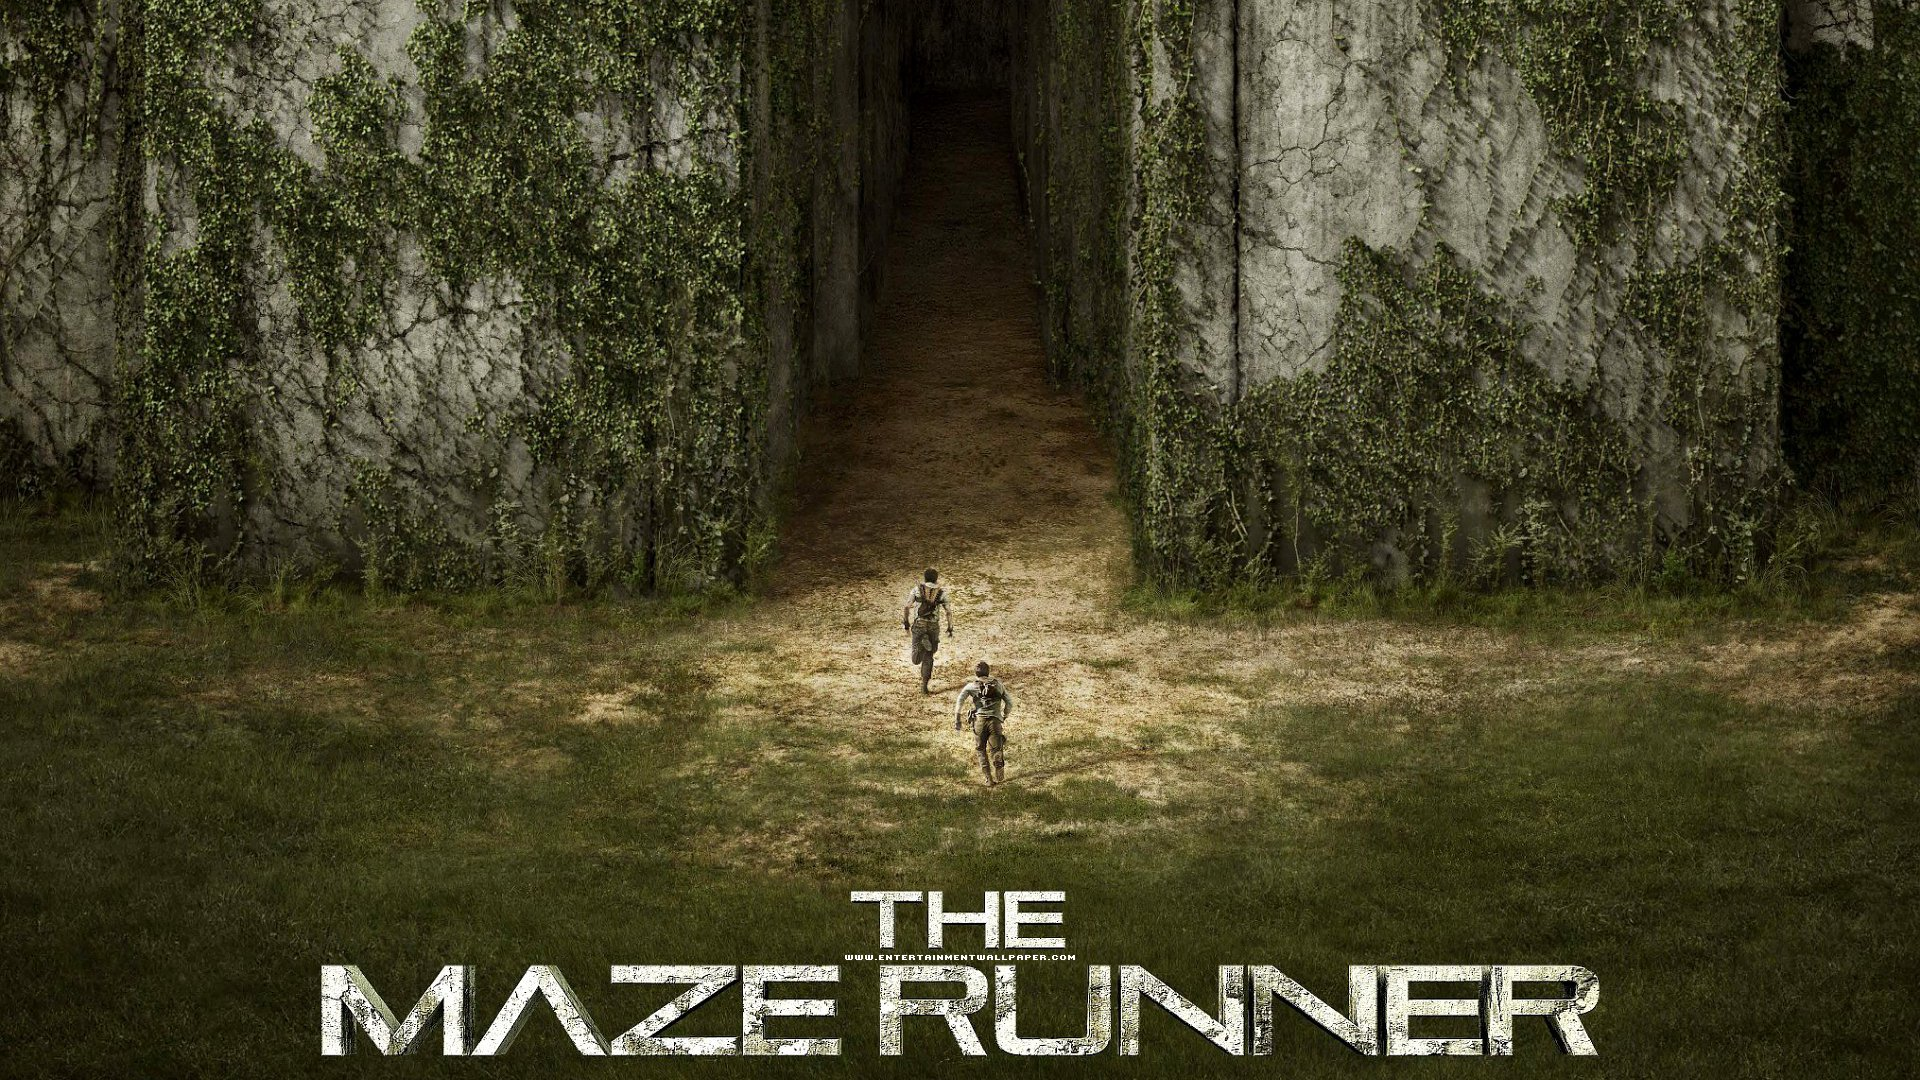 The Maze Runner Movie Desktop Wallpaper 54363 1920x1080px